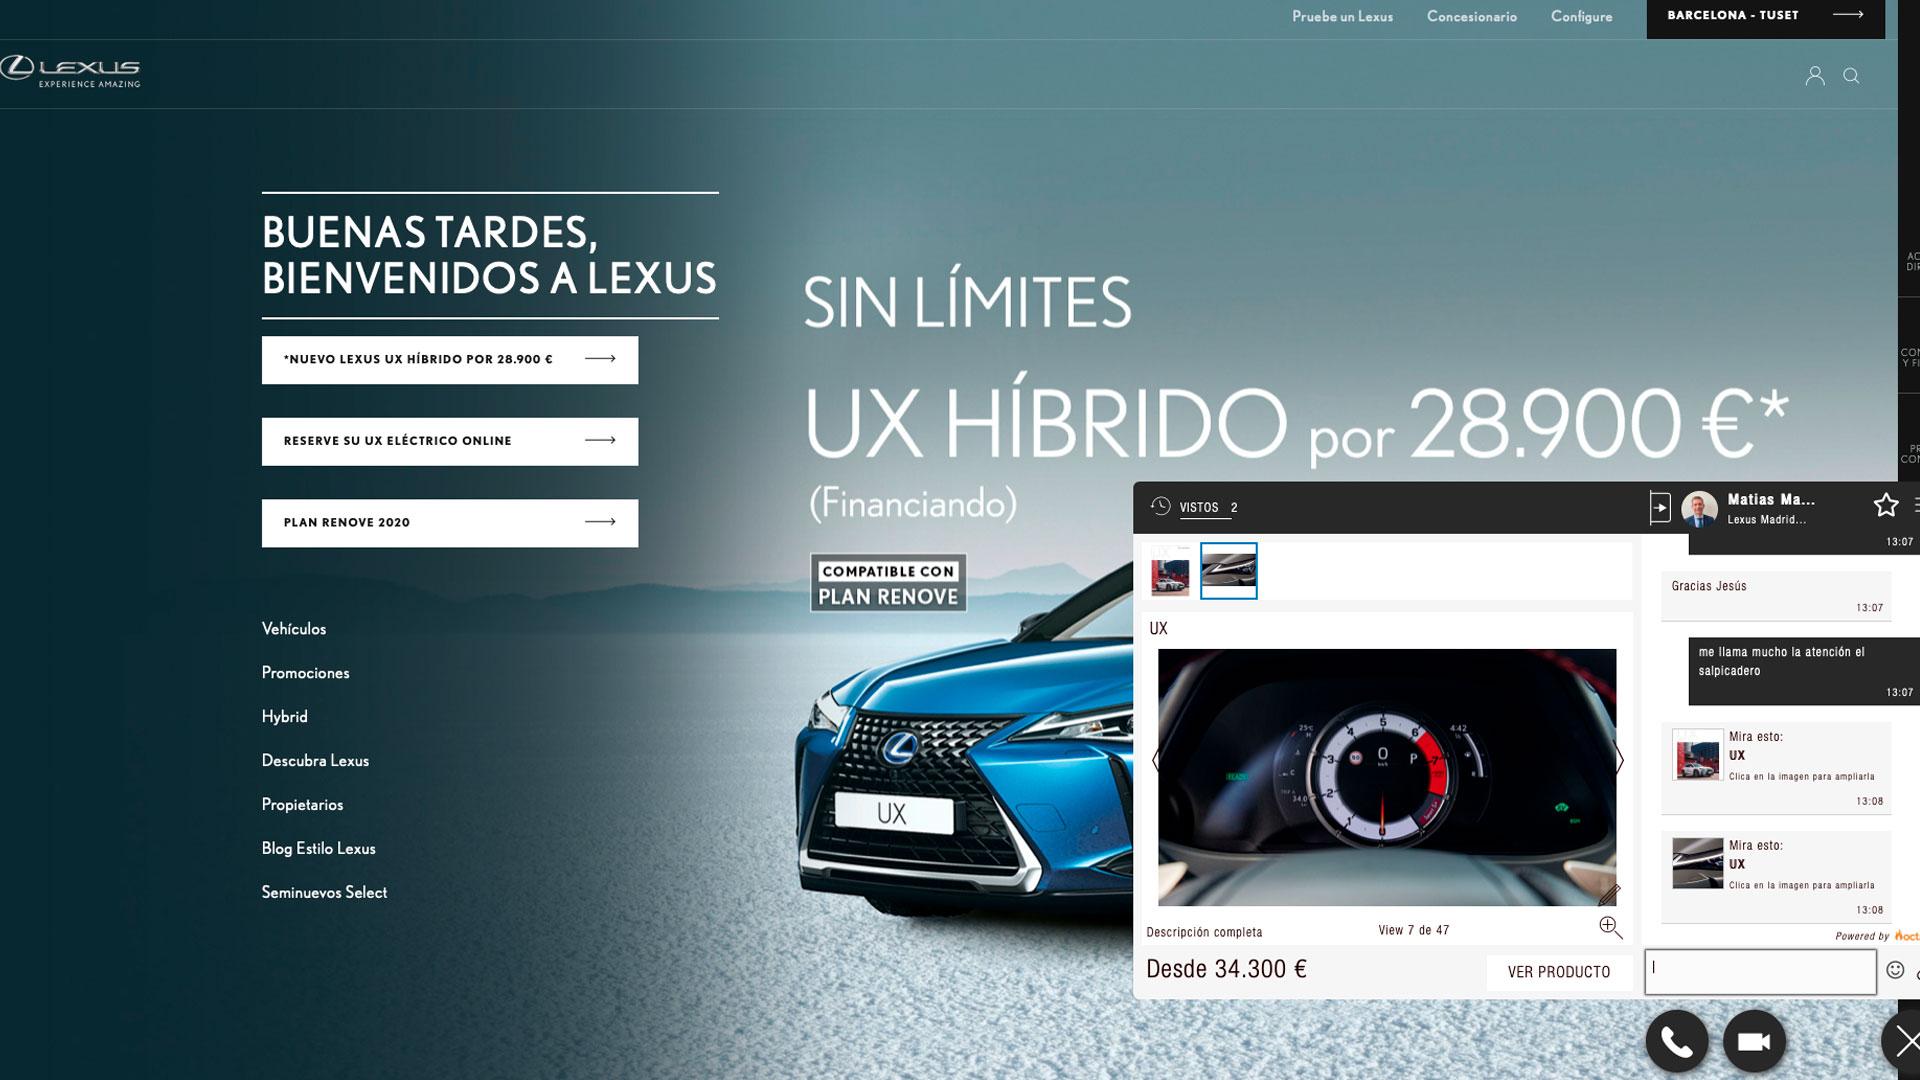 Imagen del livechat de Lexus